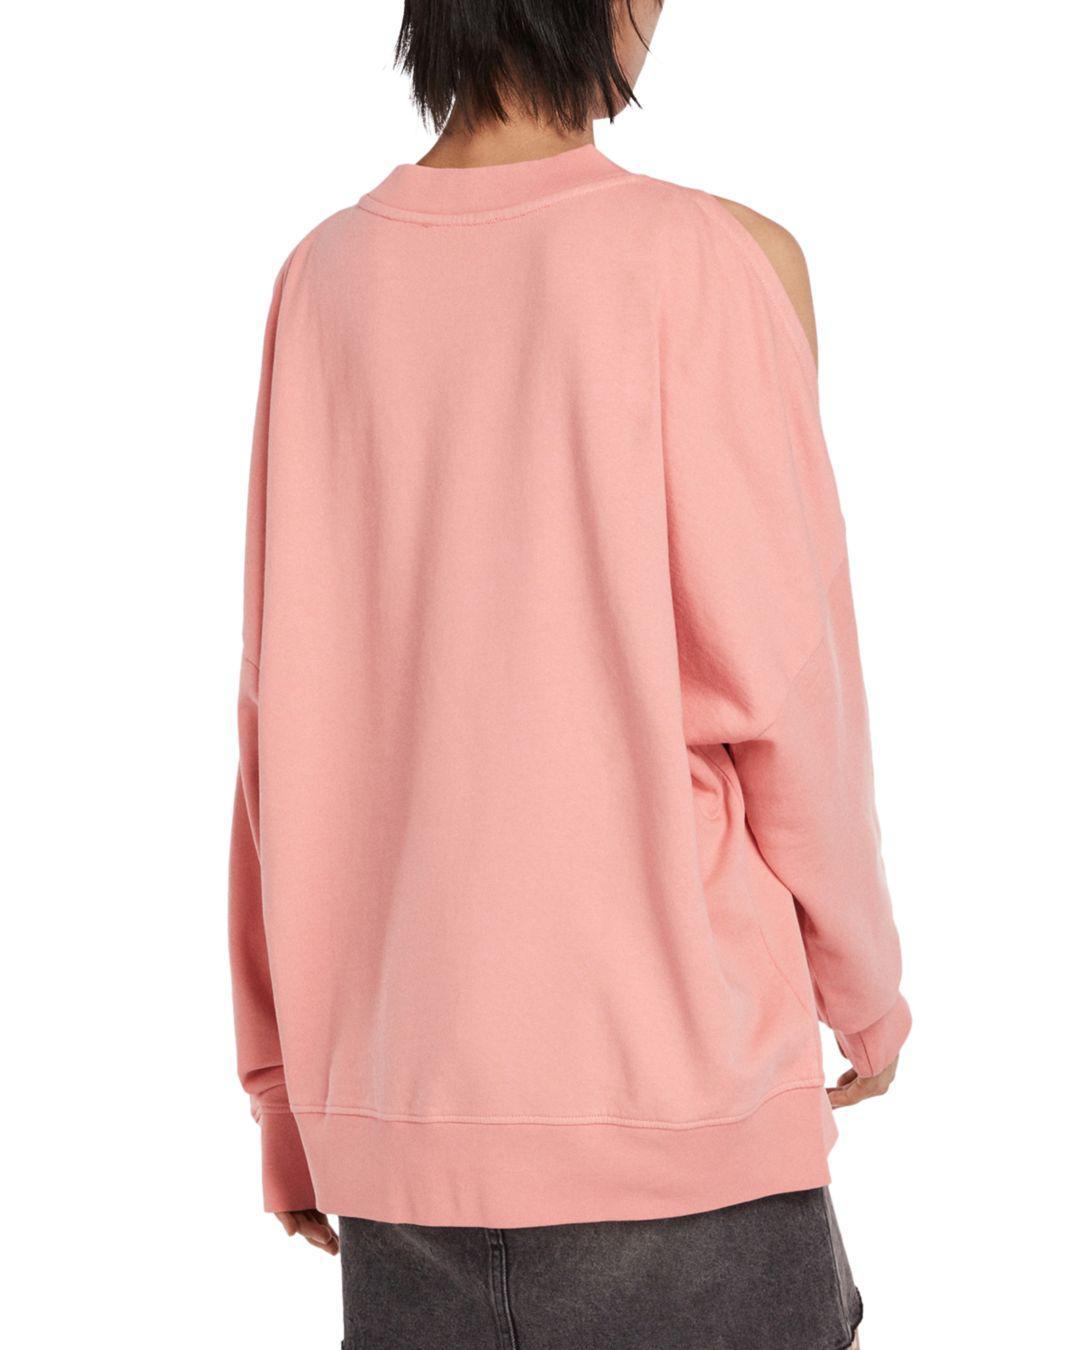 c498caa9e121d7 Lyst - AllSaints Unai Oversized Cold-shoulder Sweatshirt in Pink - Save 20%